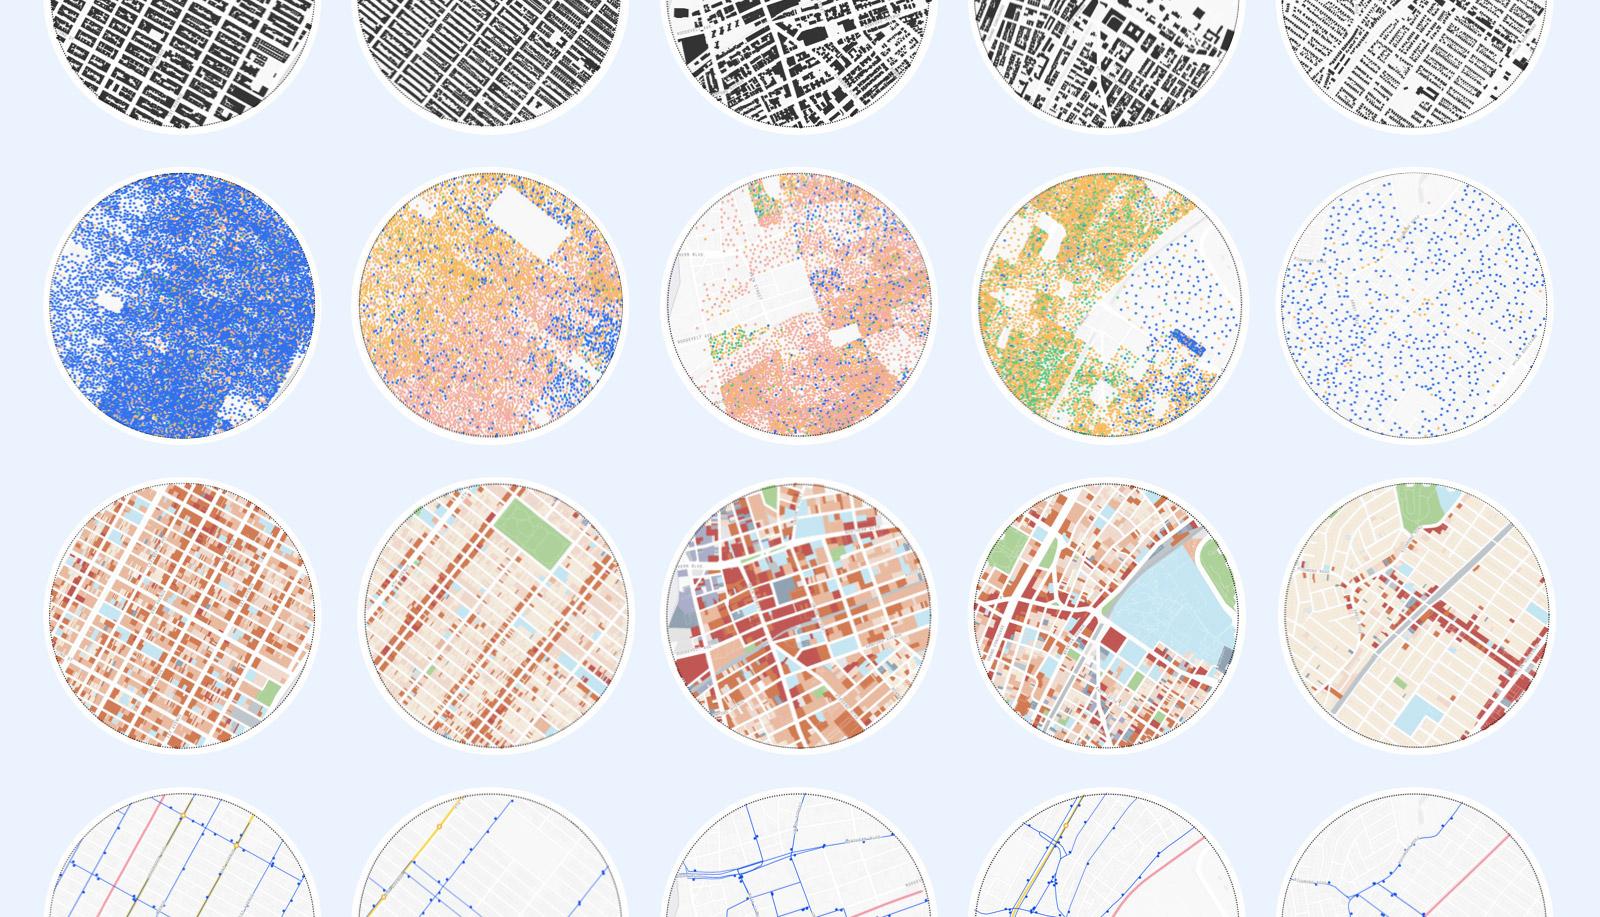 Morphocode Explorer - Interactive tool for urban analysis